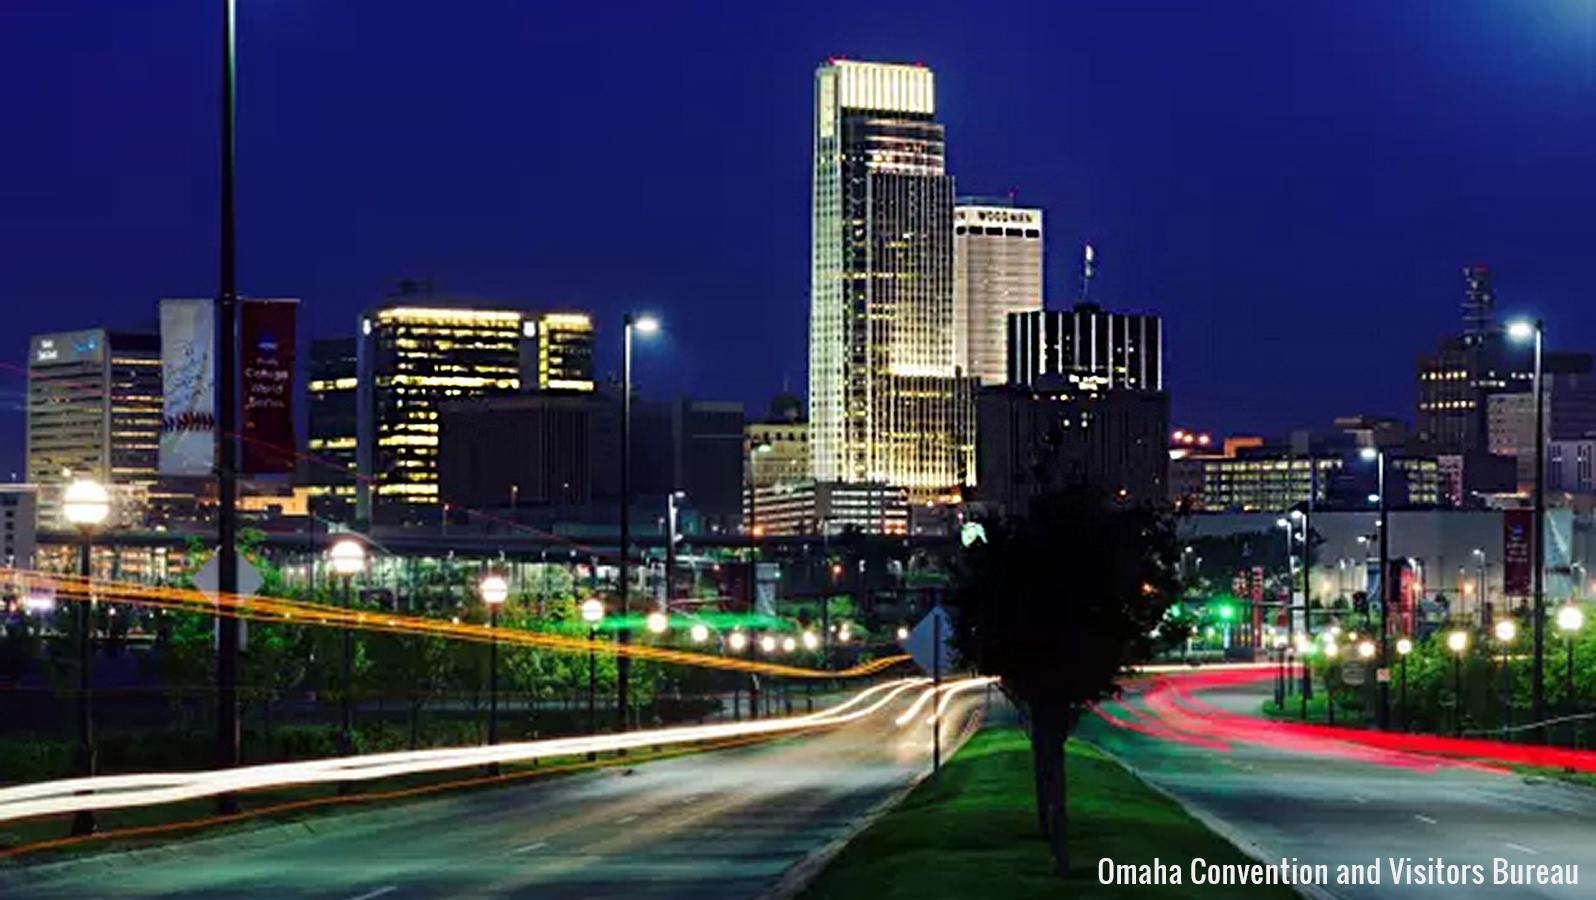 skyline shot of Omaha